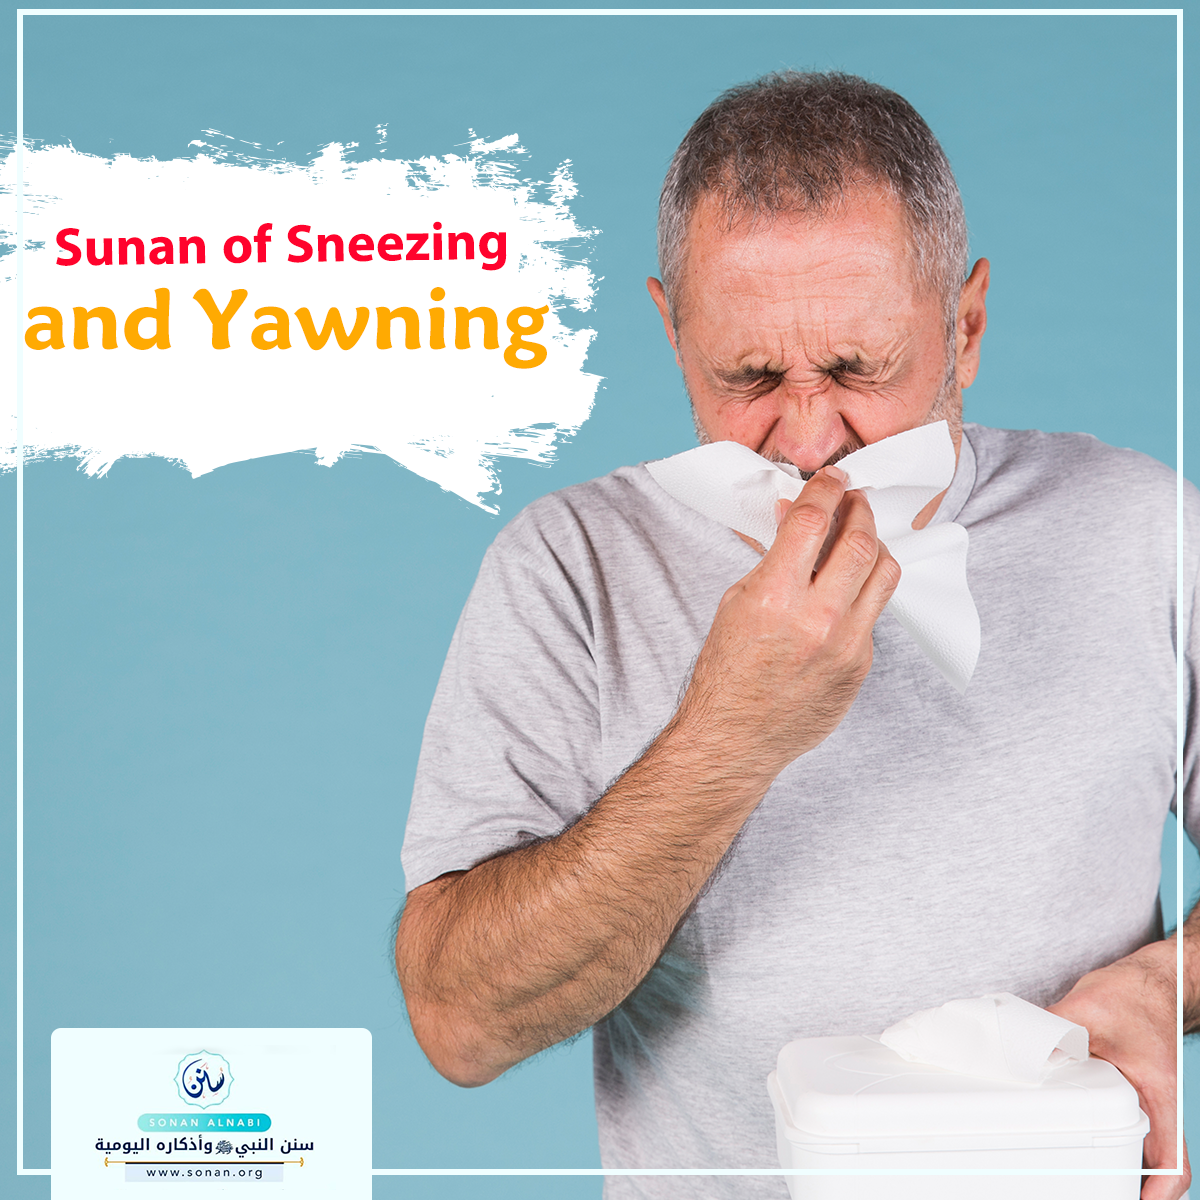 Sunan of Sneezing and Yawning